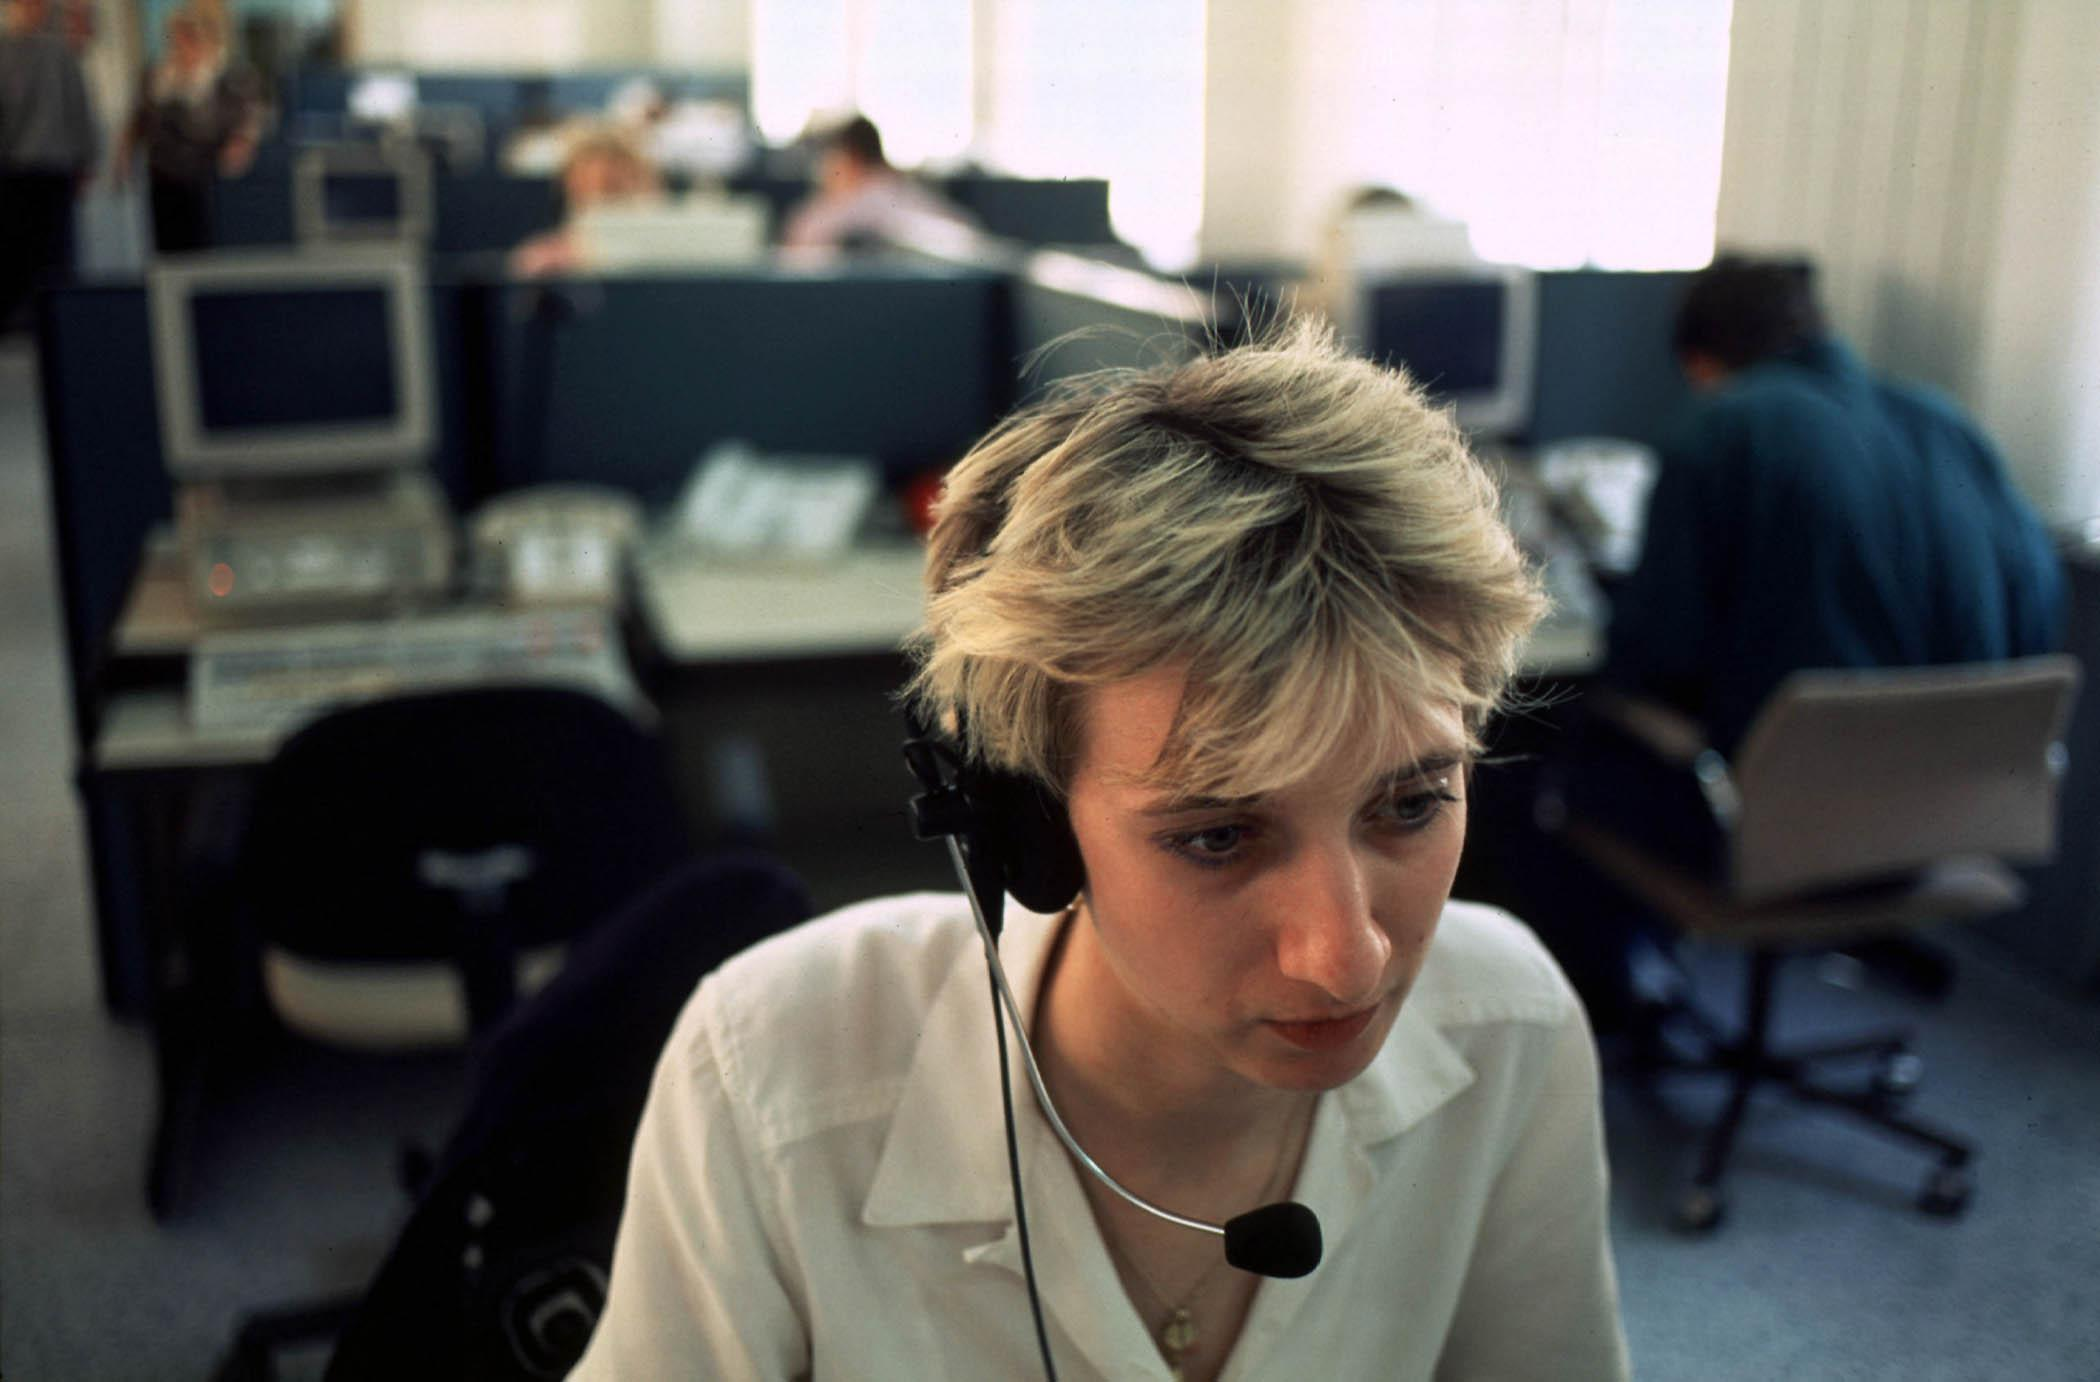 A worker at SPT Telecom